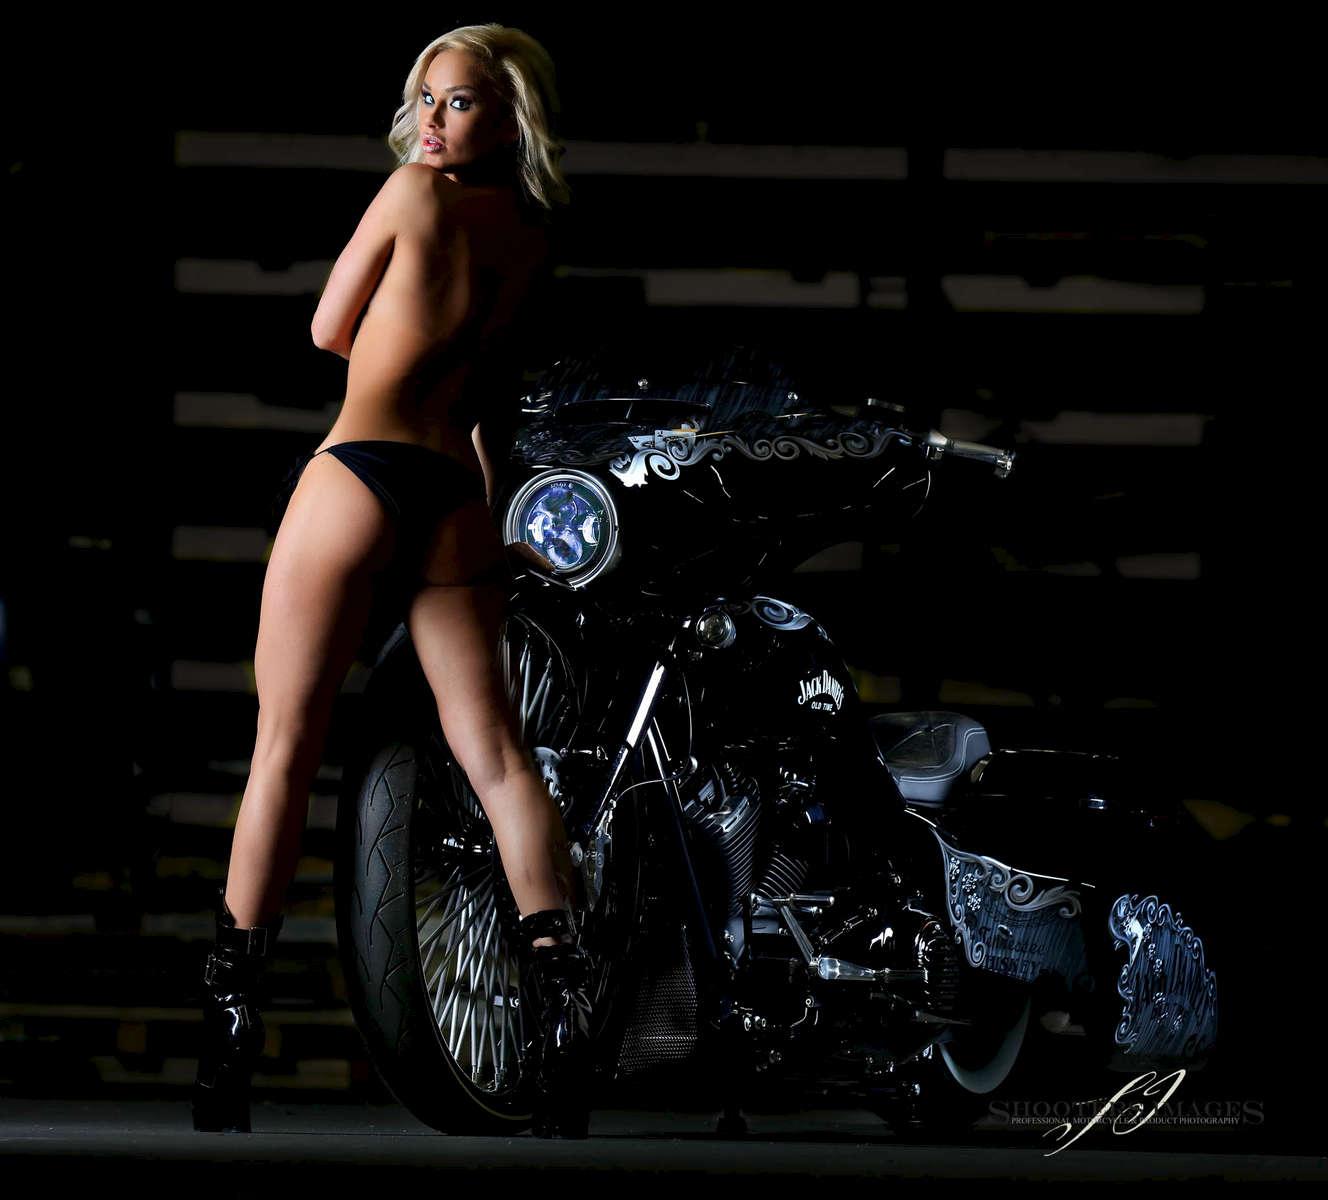 Jack Daniels Bike - F Bomb Baggers